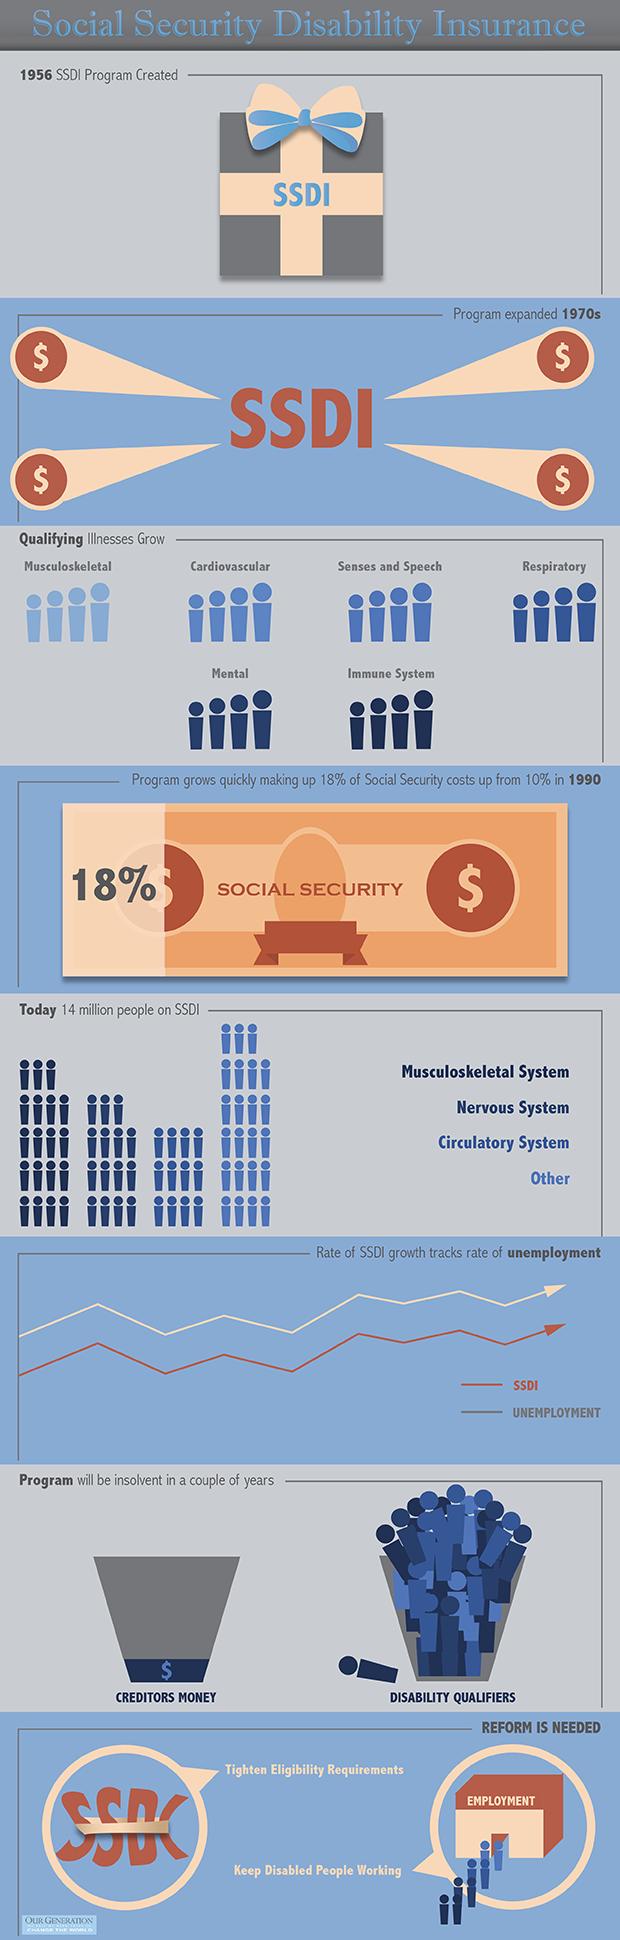 ssdi-infographic